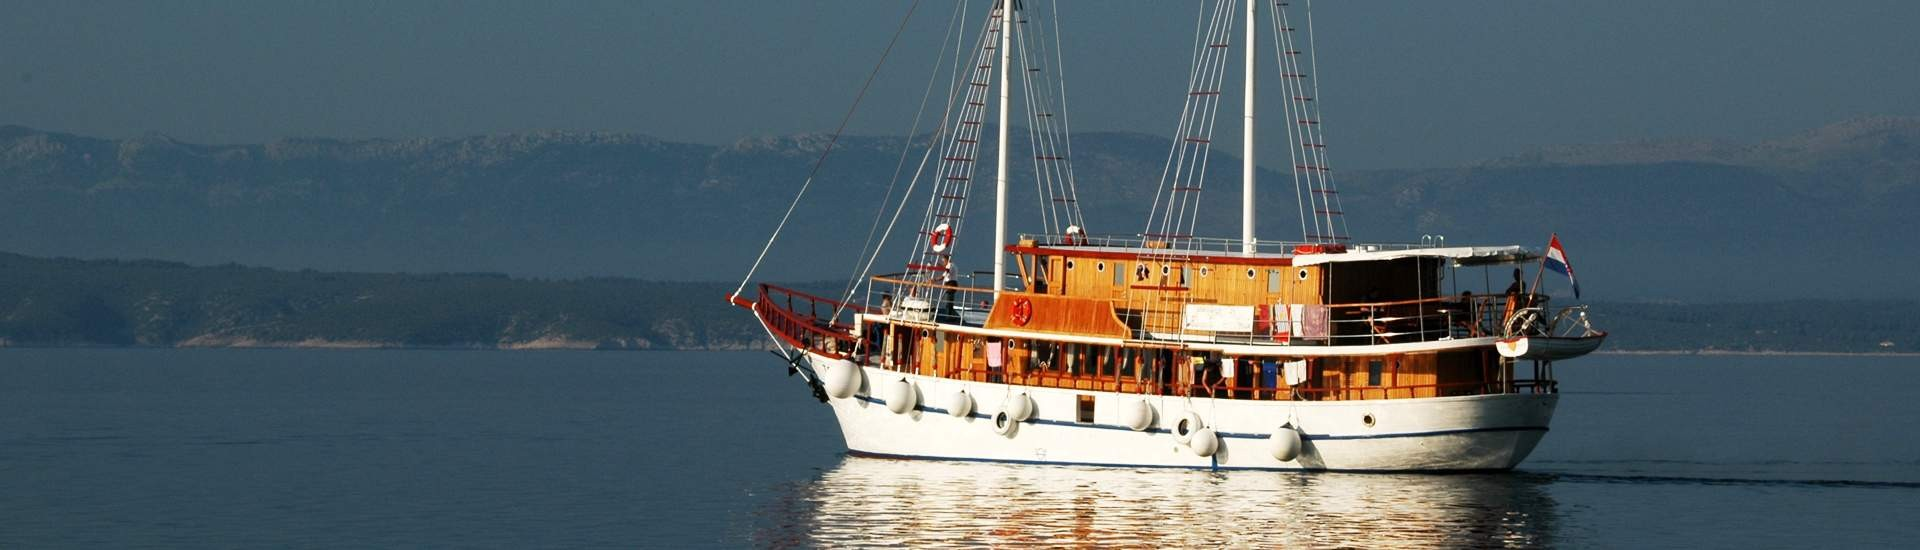 Croatia Gullets and motor sailers